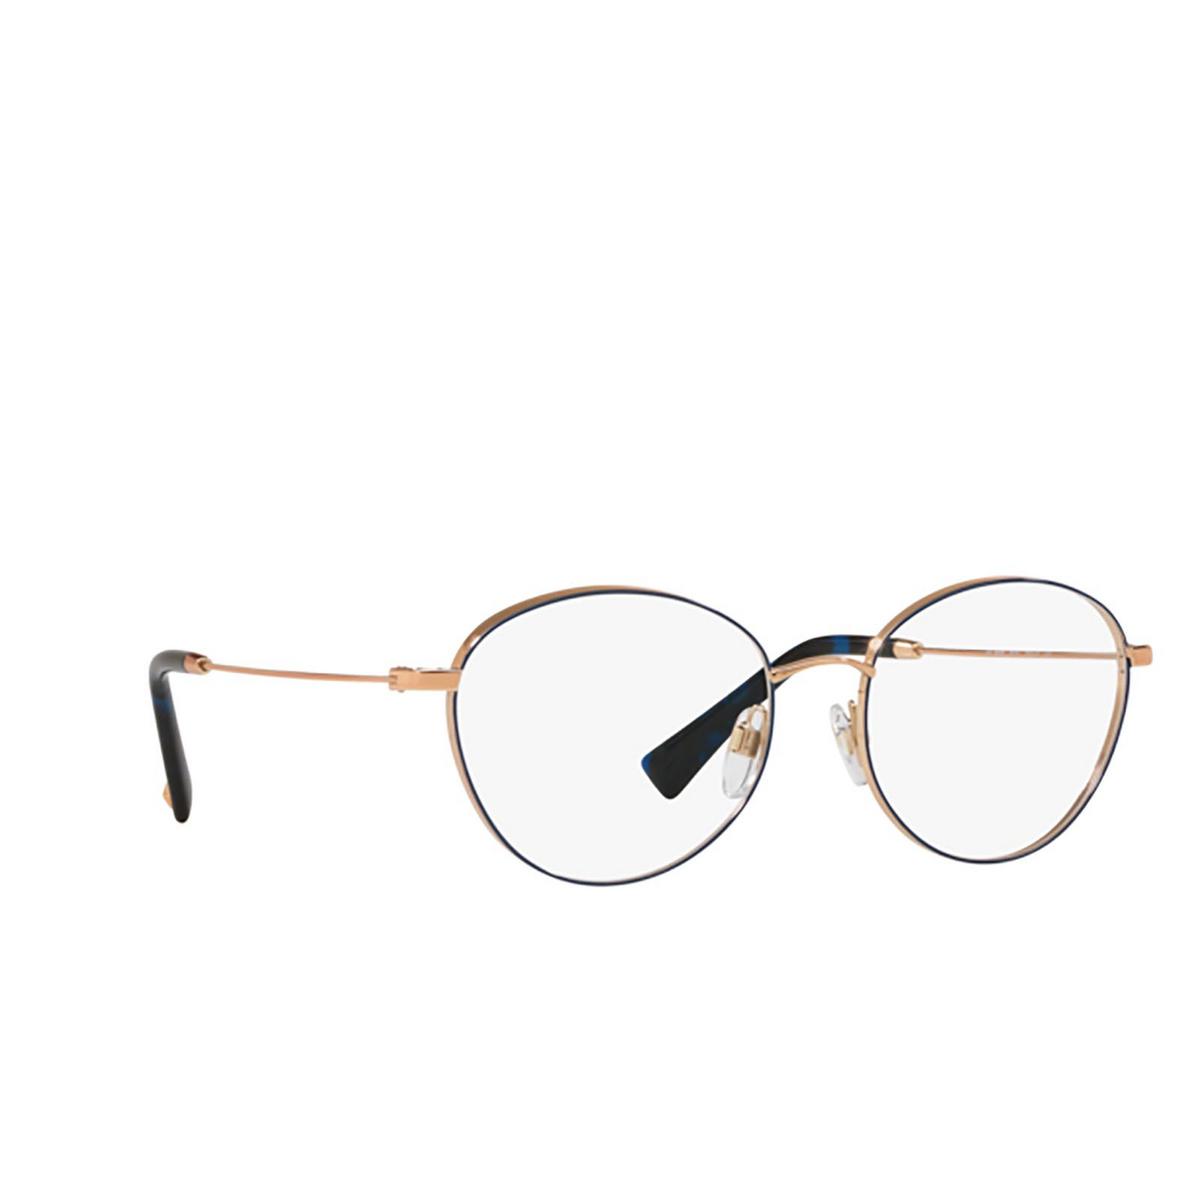 Valentino® Oval Eyeglasses: VA1003 color Rose Gold / Blue 3031 - three-quarters view.